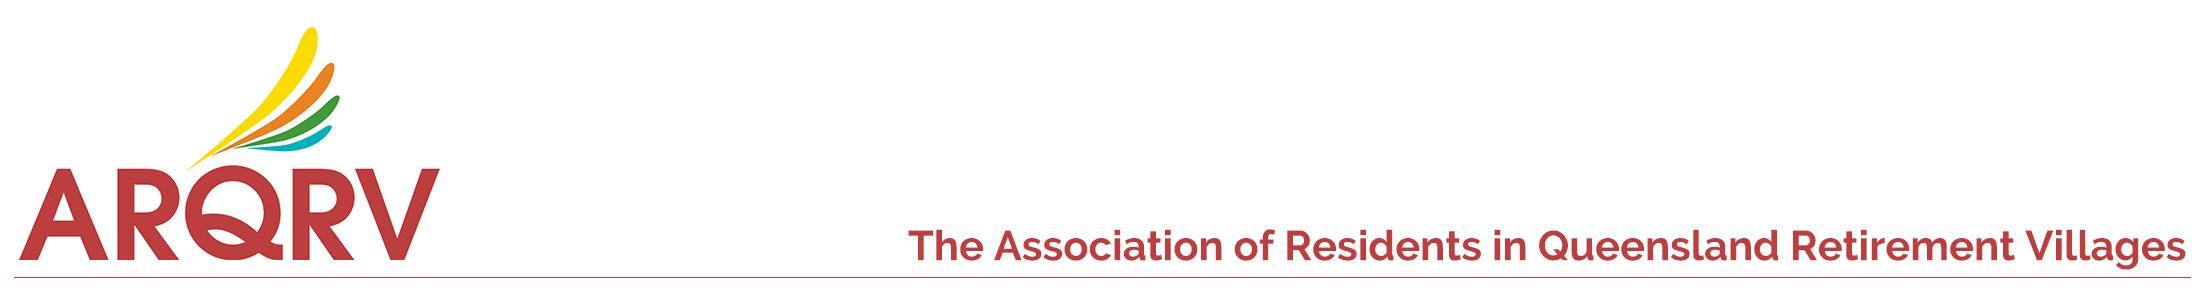 Association of Residents of Queensland Retirement Villages